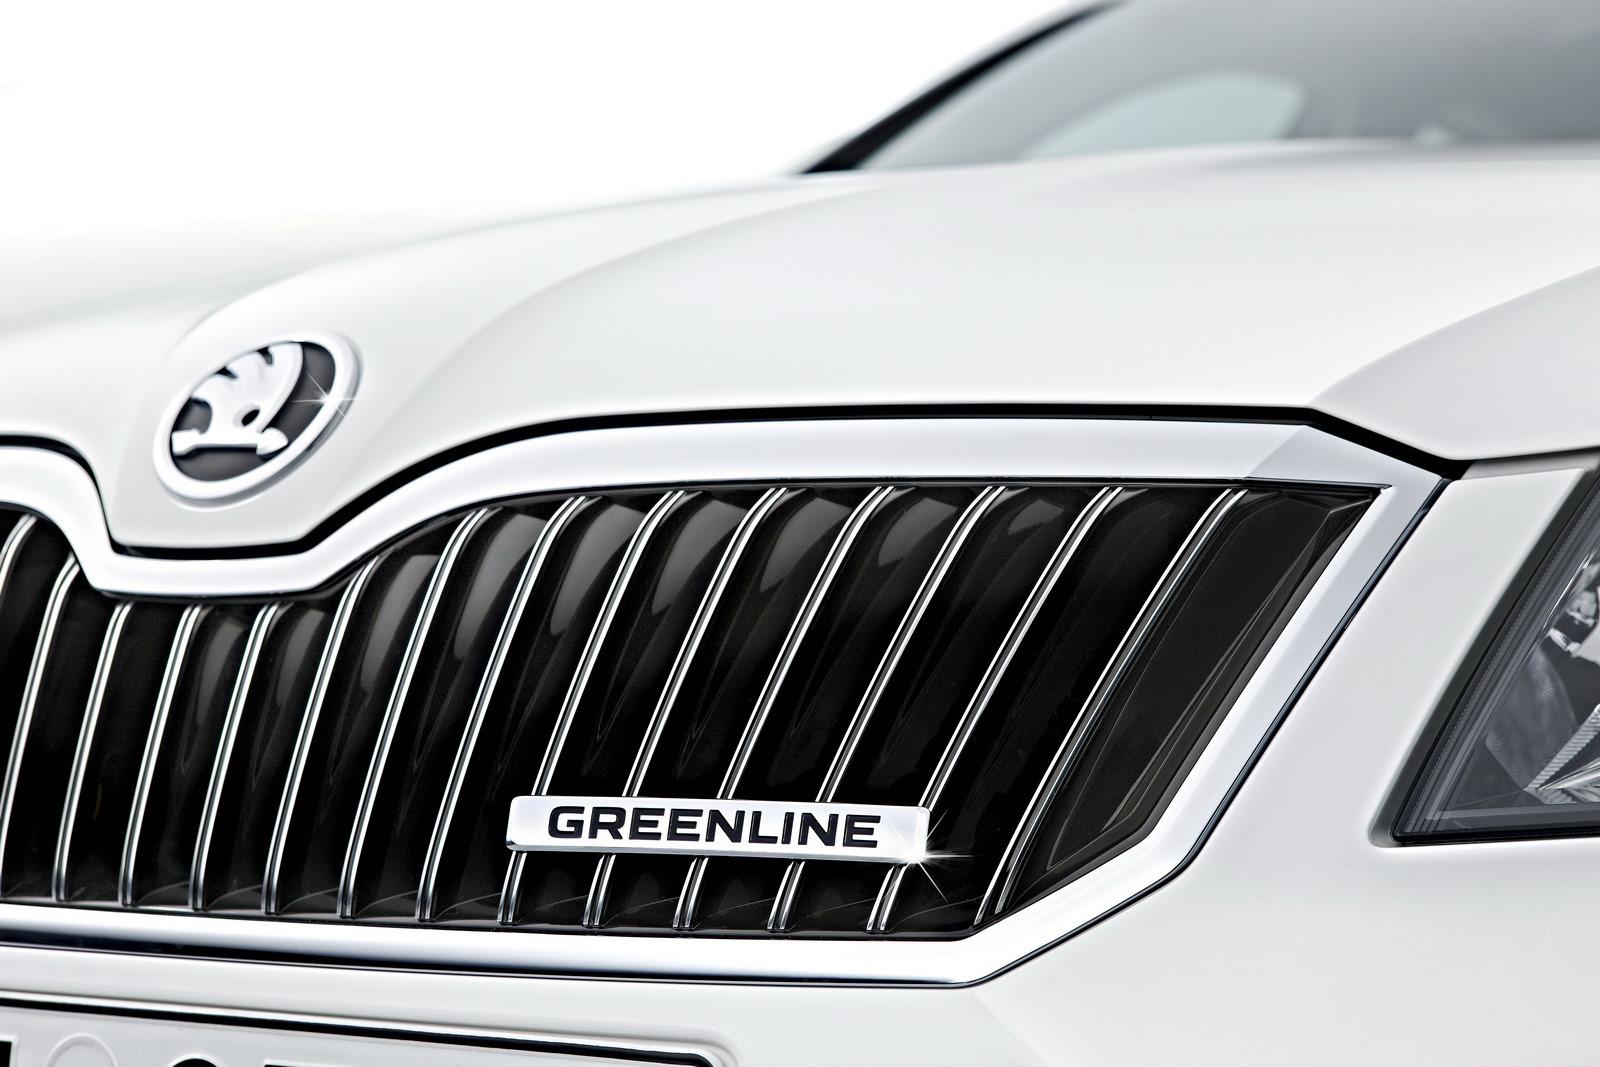 New Skoda Octavia GreenLine Announced: 3.3 L/100KM and 87 ...